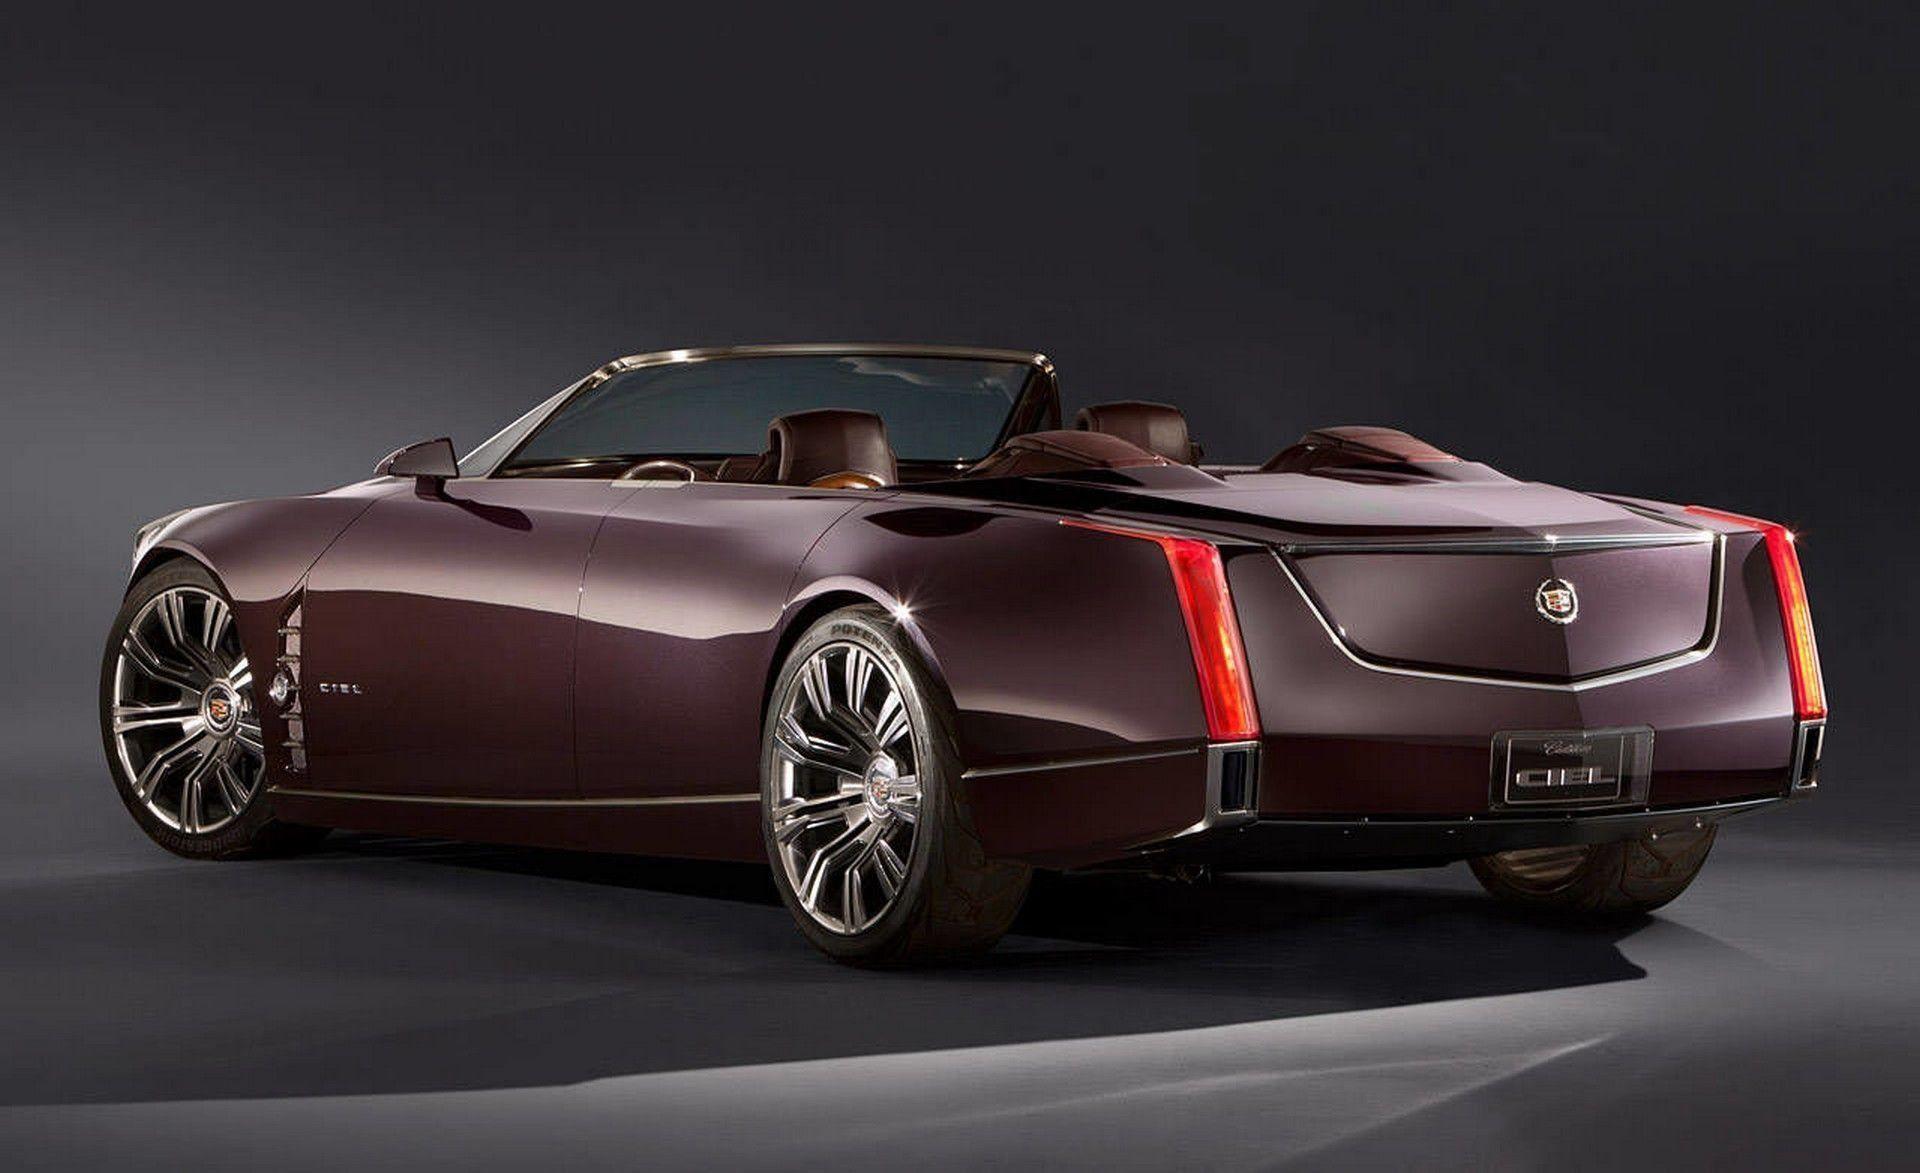 2020 Cadillac Elmiraj Images